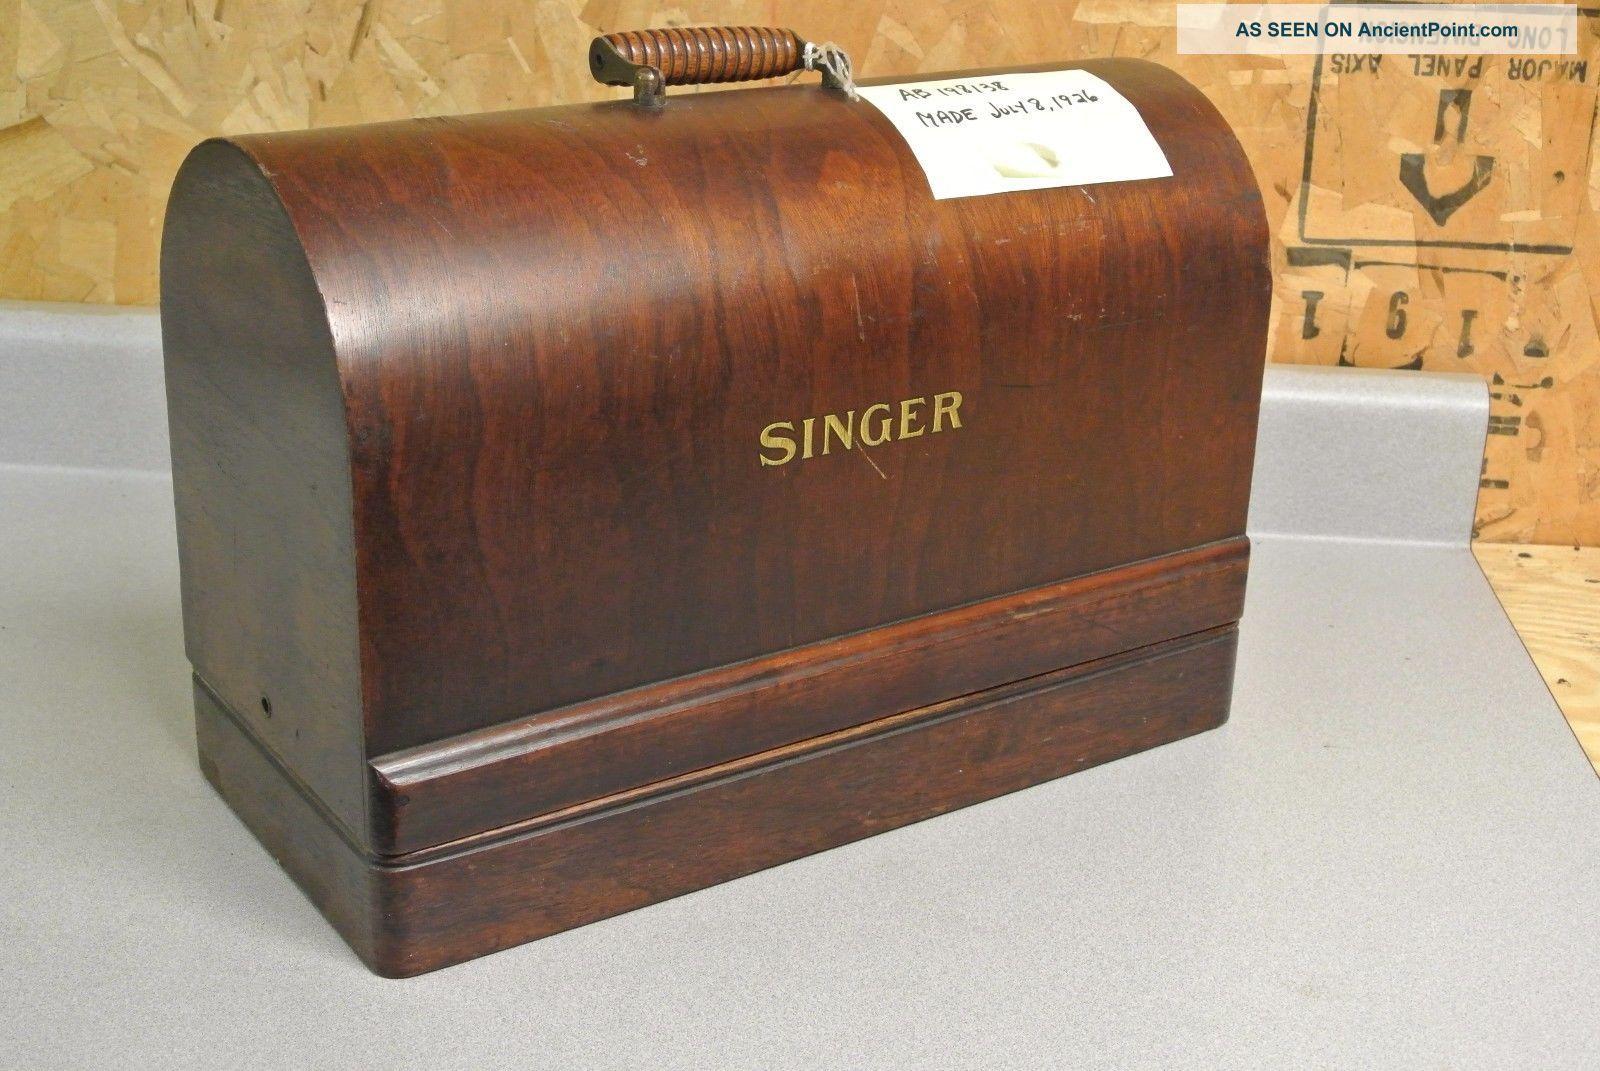 Antique Singer Sewing Machine Sewing Machines photo